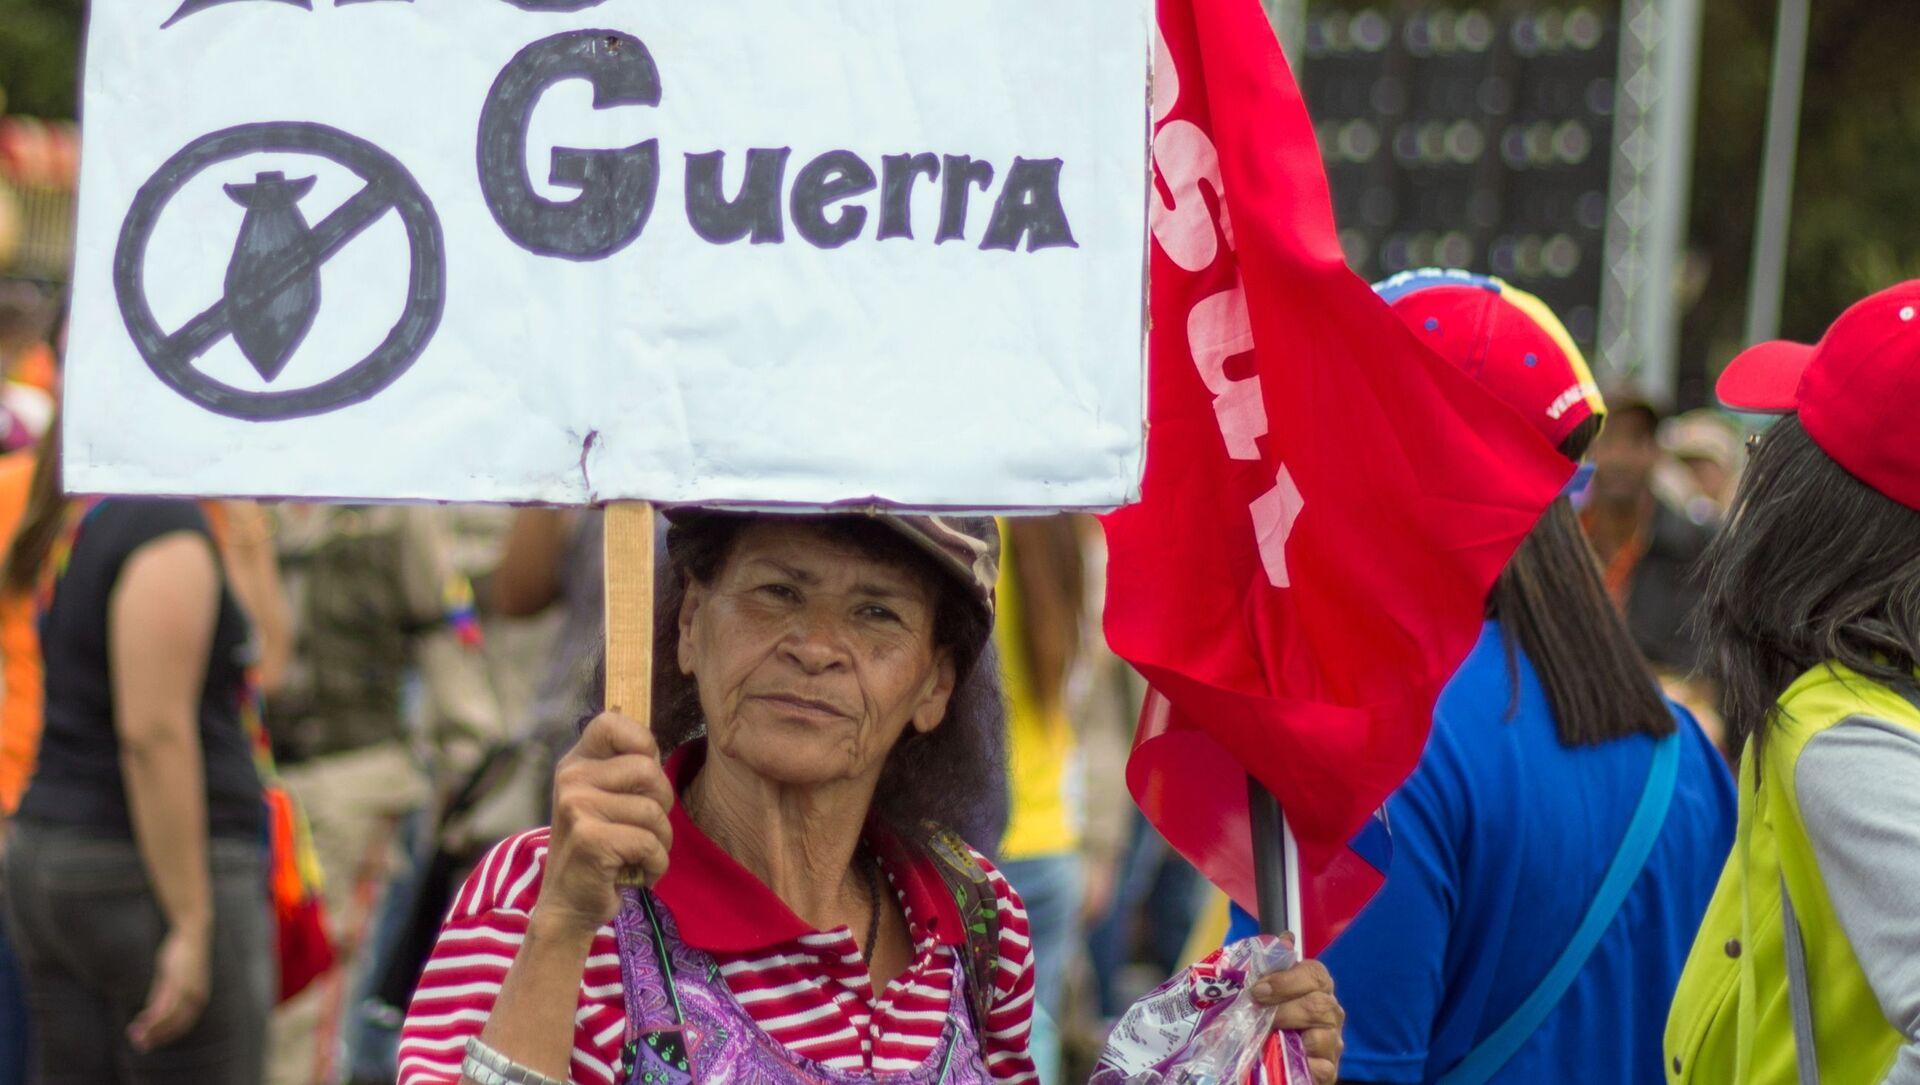 Участница во время акции в поддержку президента Венесуэлы Николаса Мадуро в Каракасе - Sputnik Italia, 1920, 07.02.2021